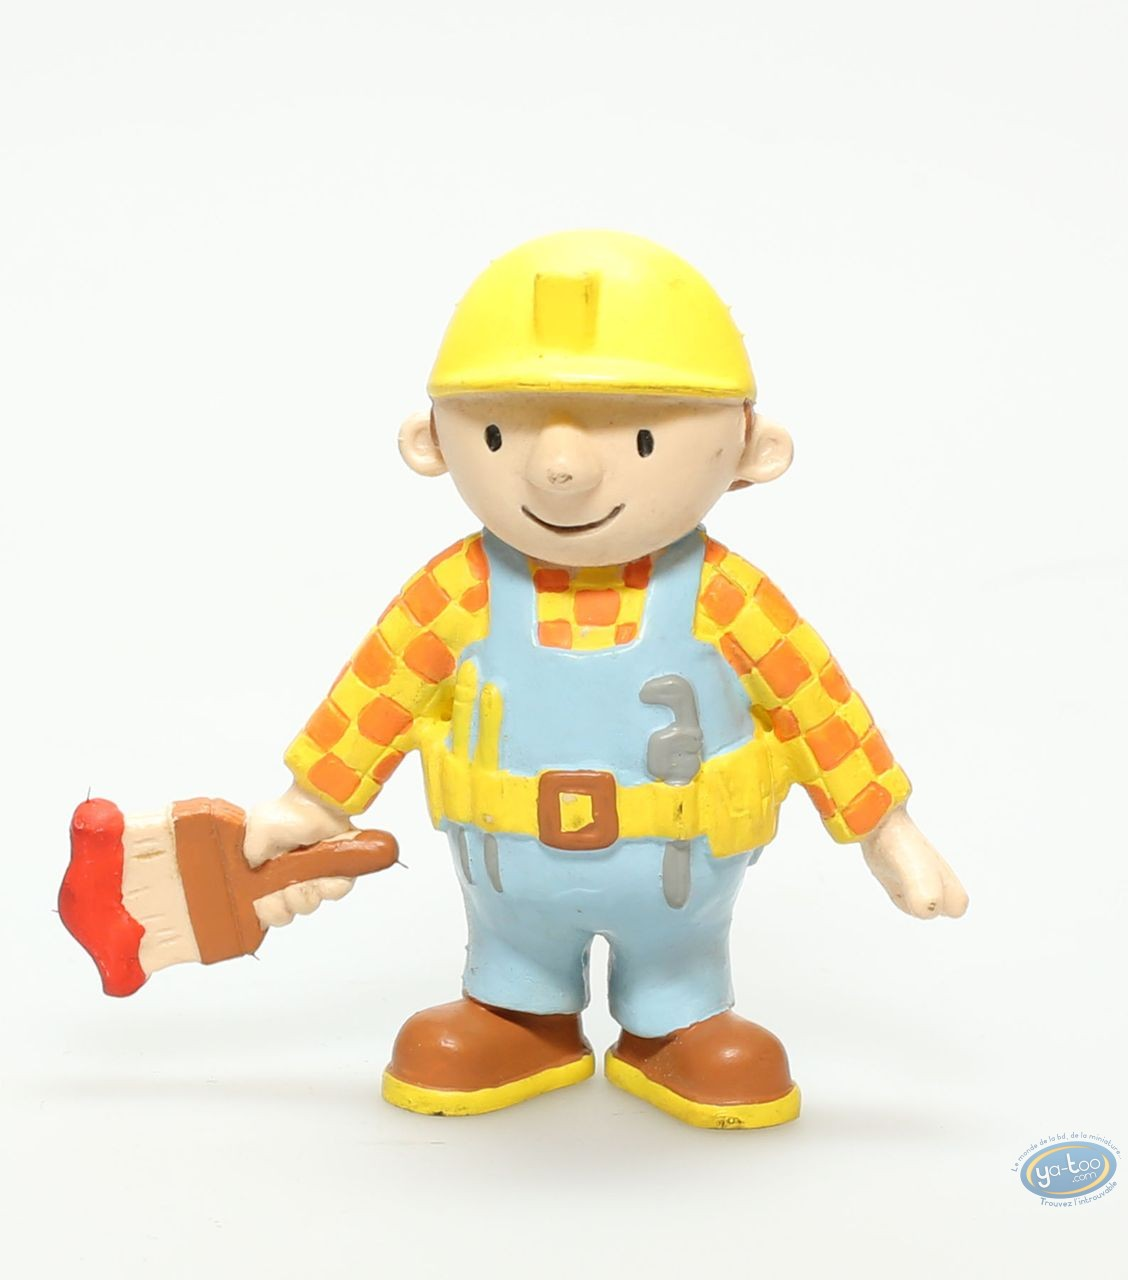 Figurine plastique, Bob le Bricoleur : Bob le bricoleur